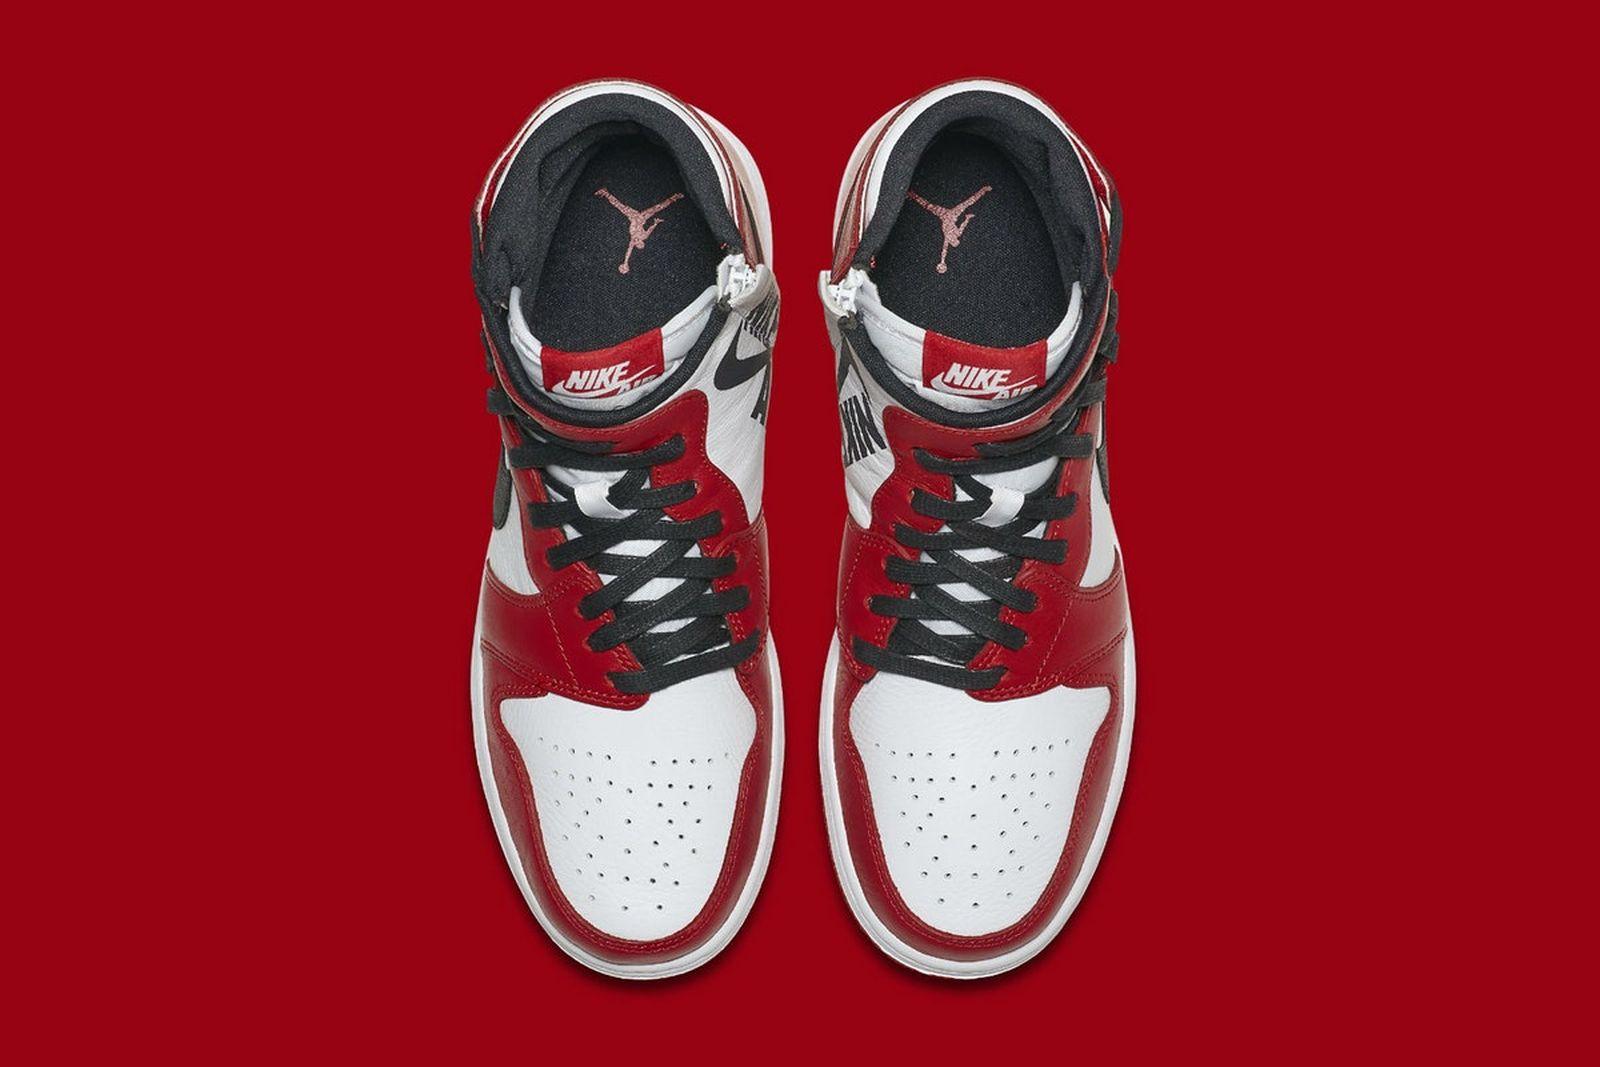 nike-air-jordan-1-rebel-chicago-release-price-03